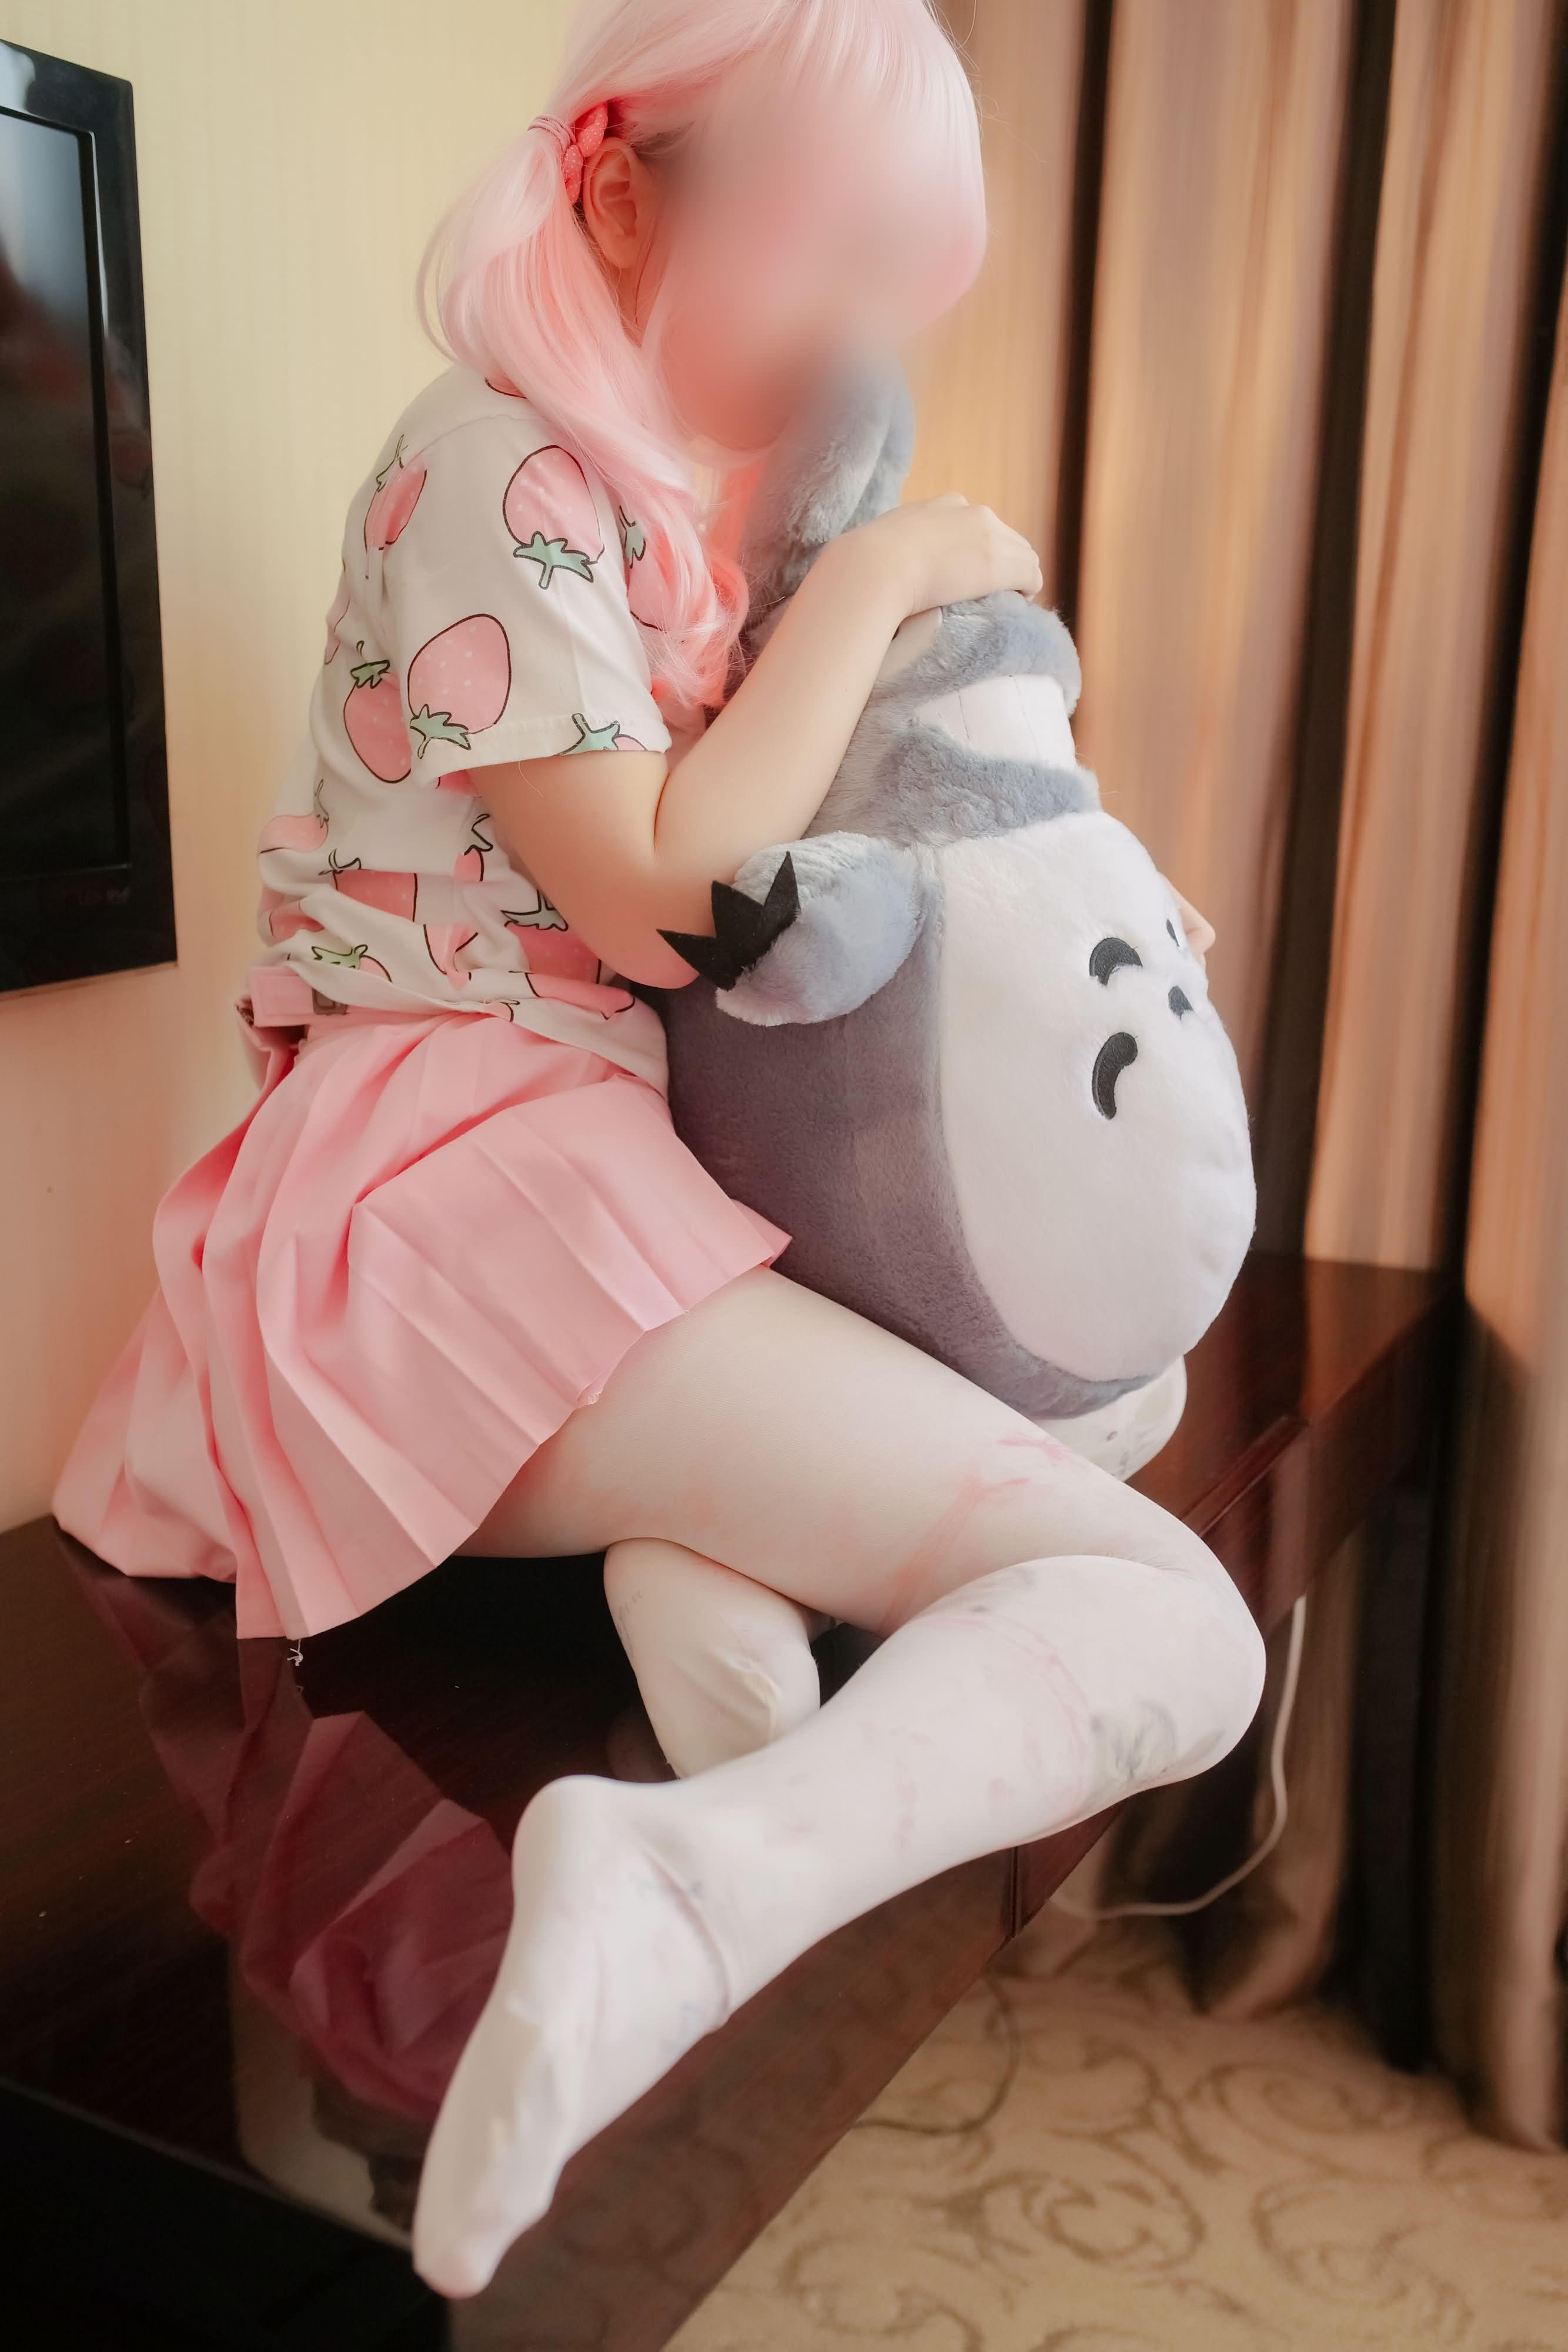 ZKaoF9 - 【The Girl Theater】 少女映画 Cosplay 龙猫与少女 90P